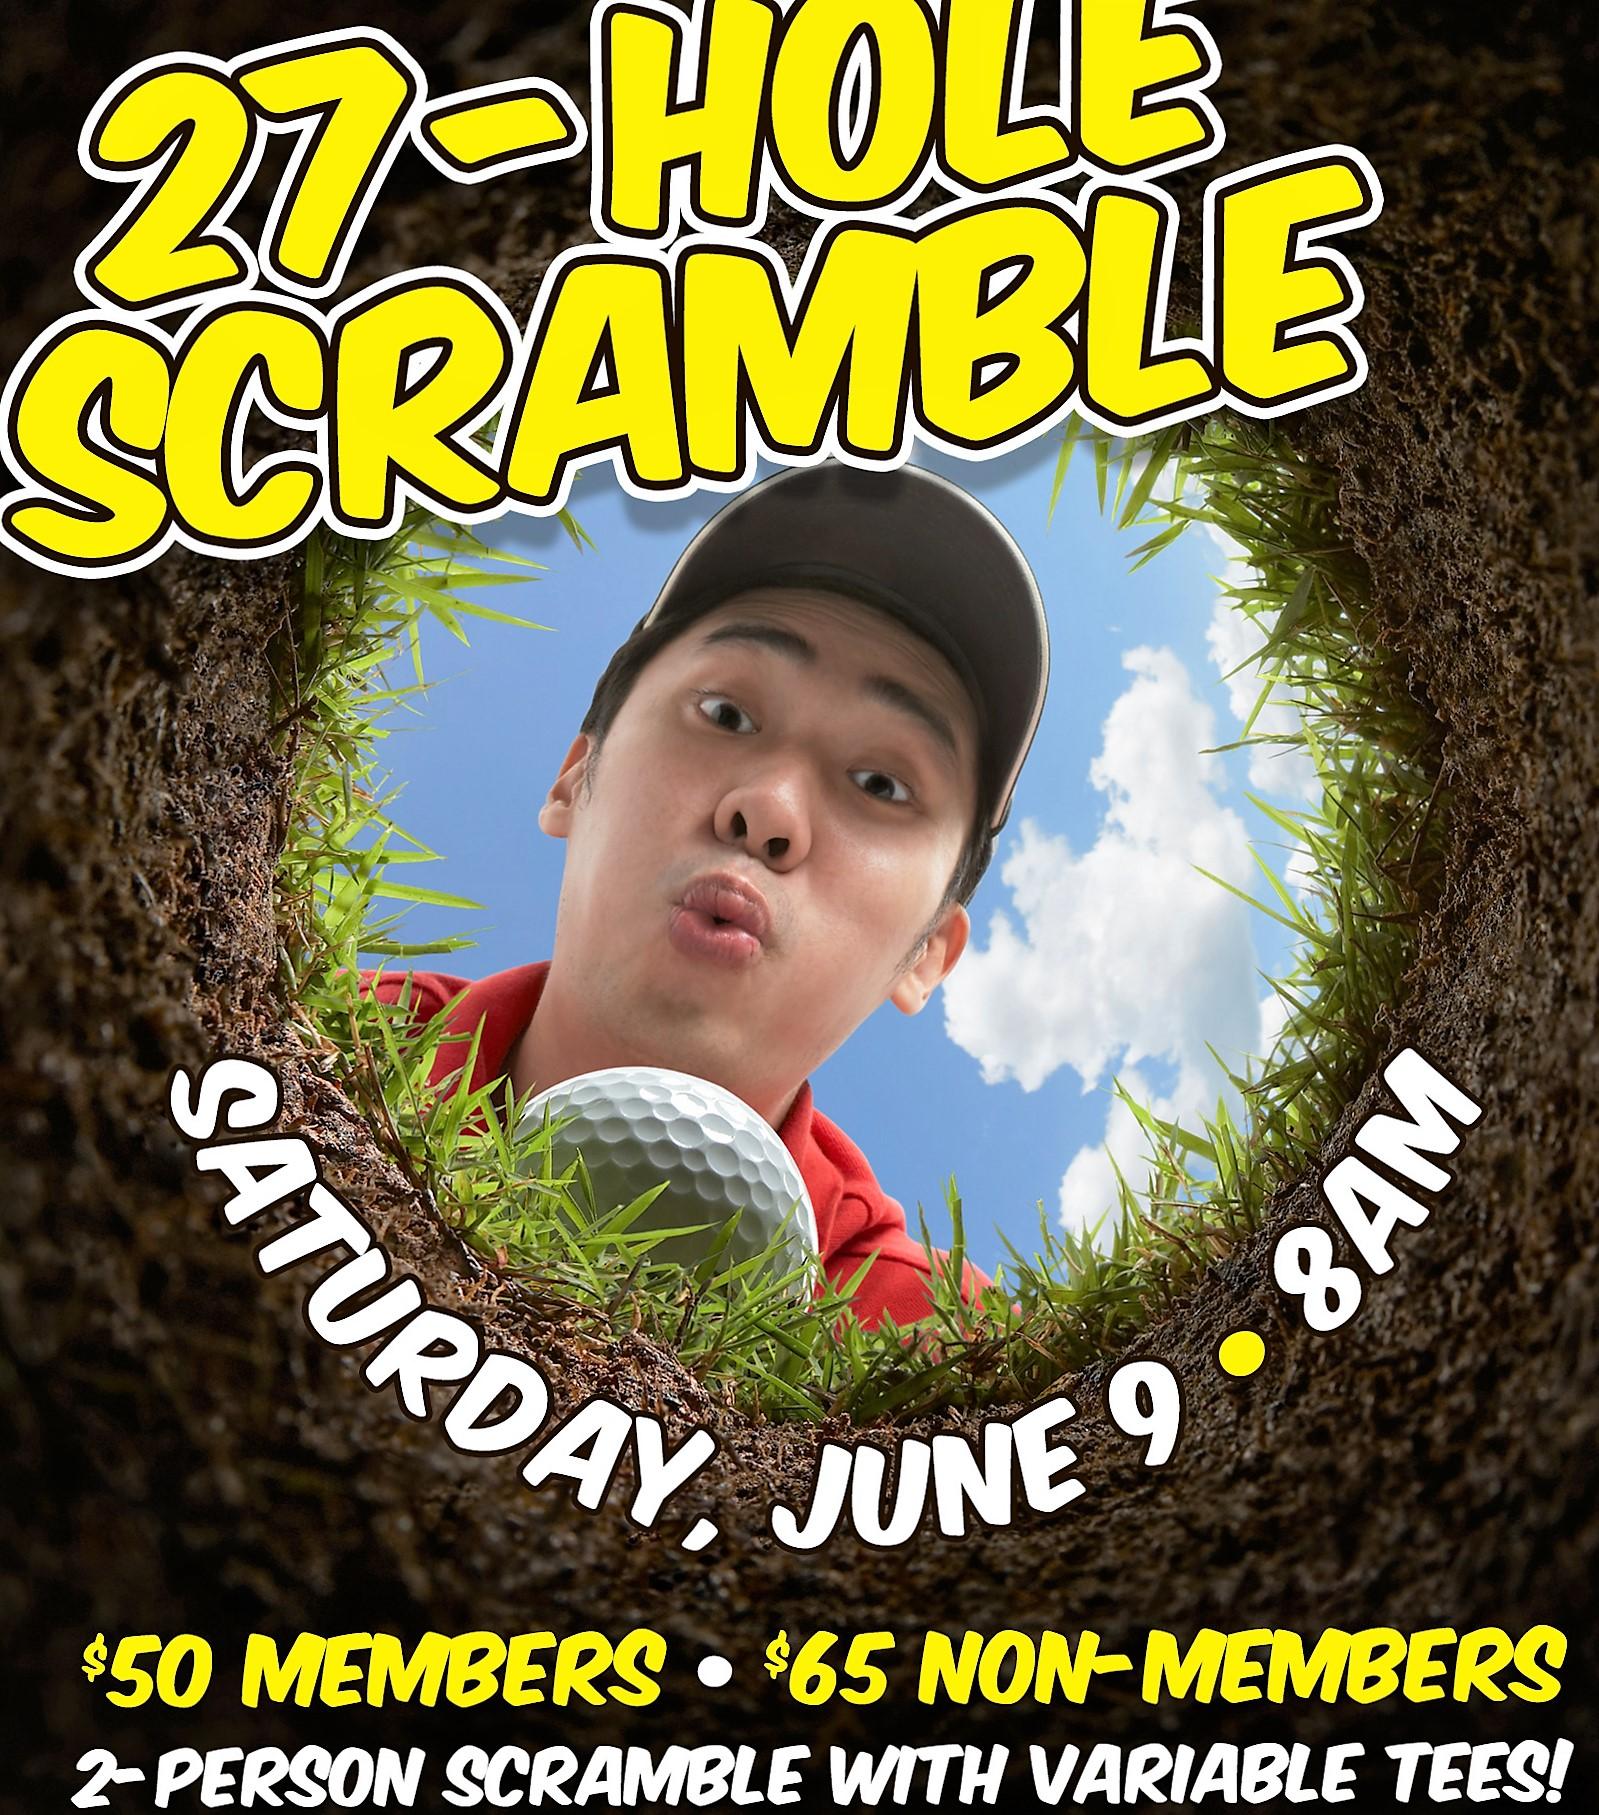 2-Person 27 Hole Scramble